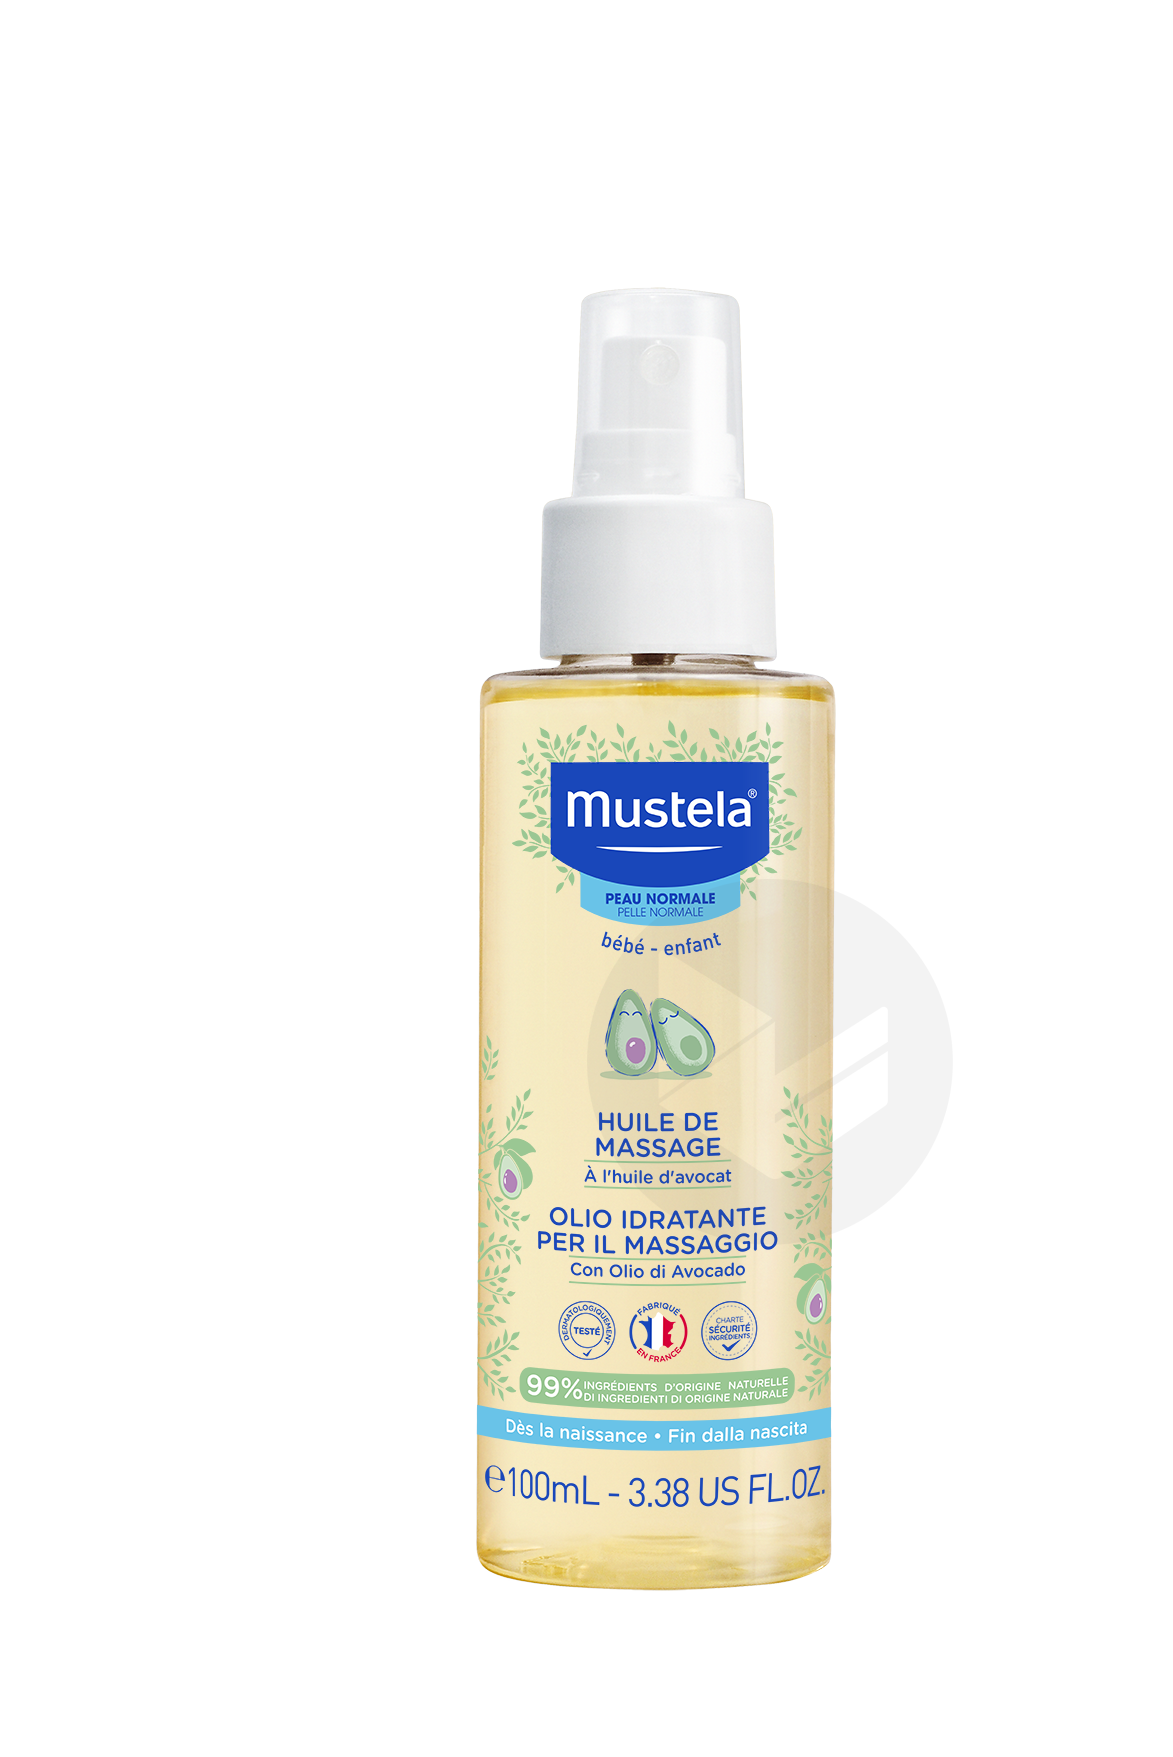 Huile de Massage Mustela 100 ml